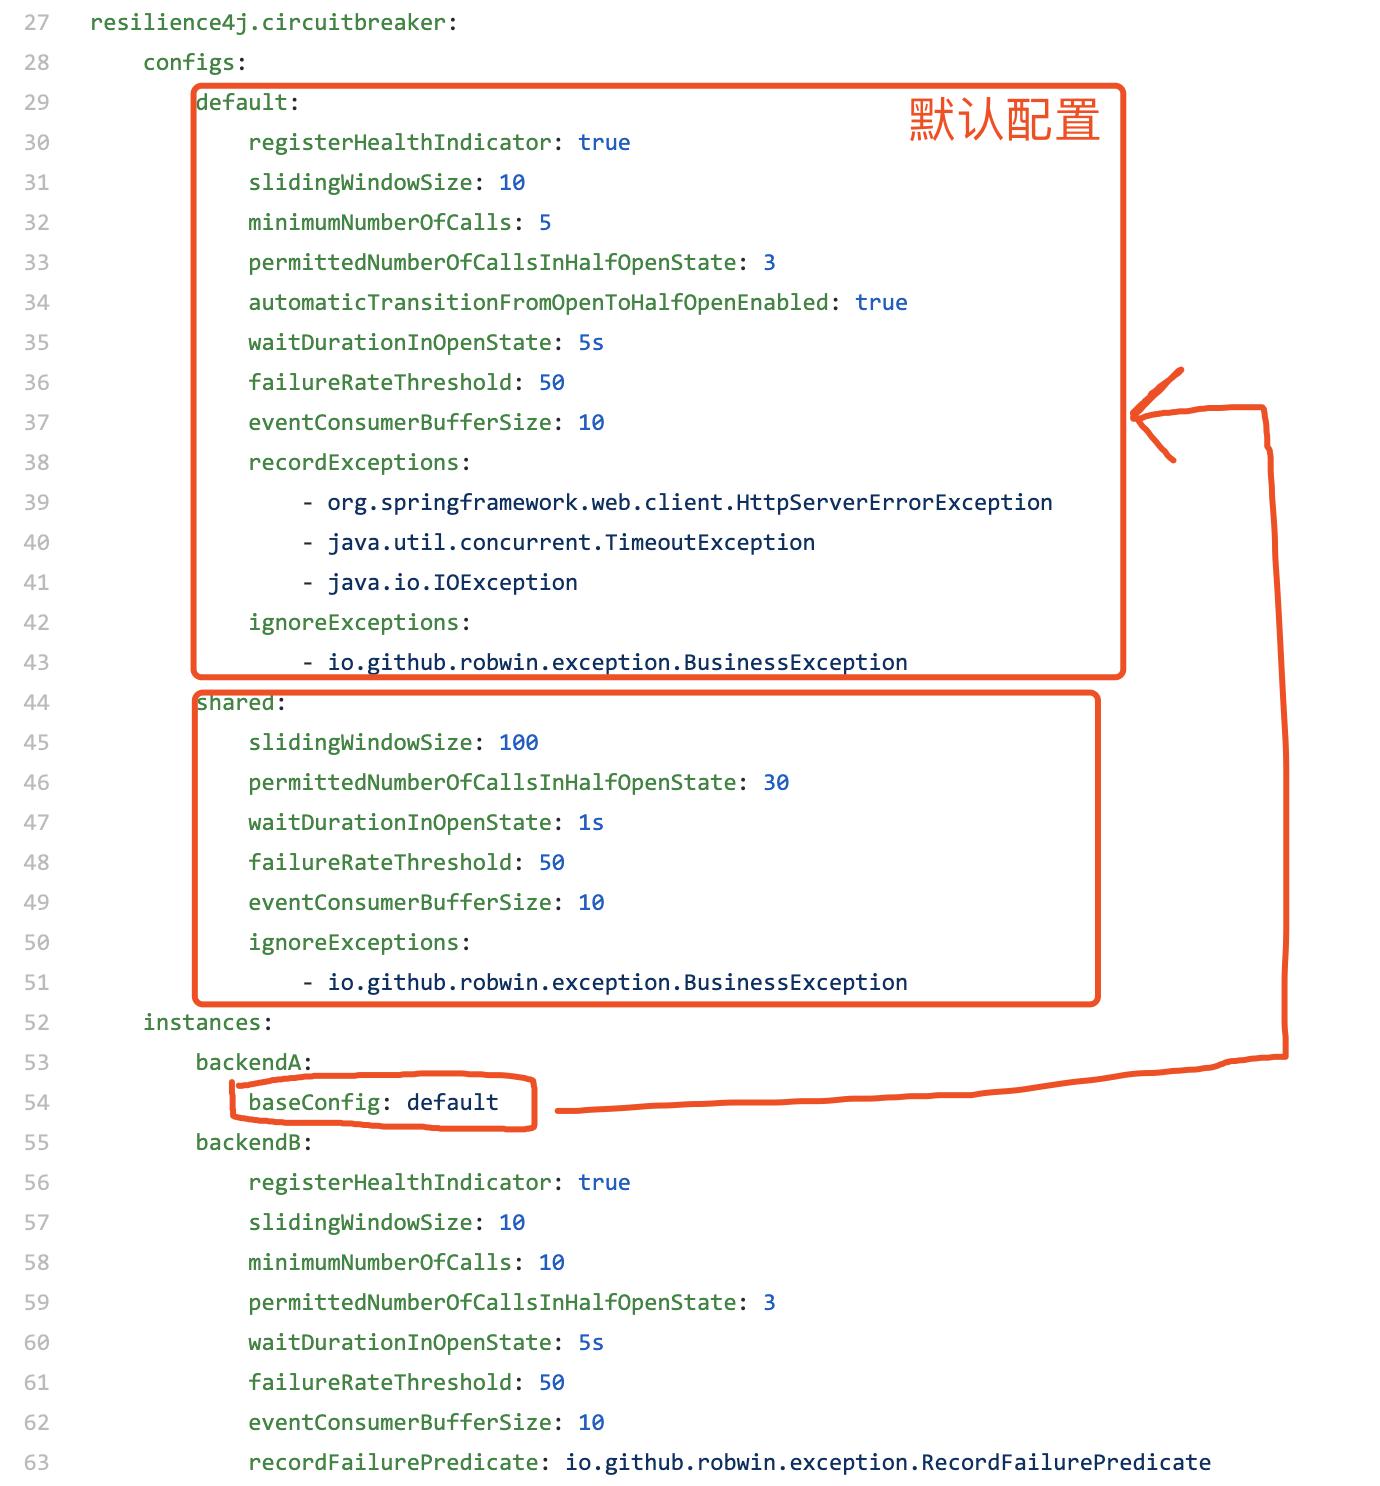 `resilience4j.circuitbreaker.configs` 示例